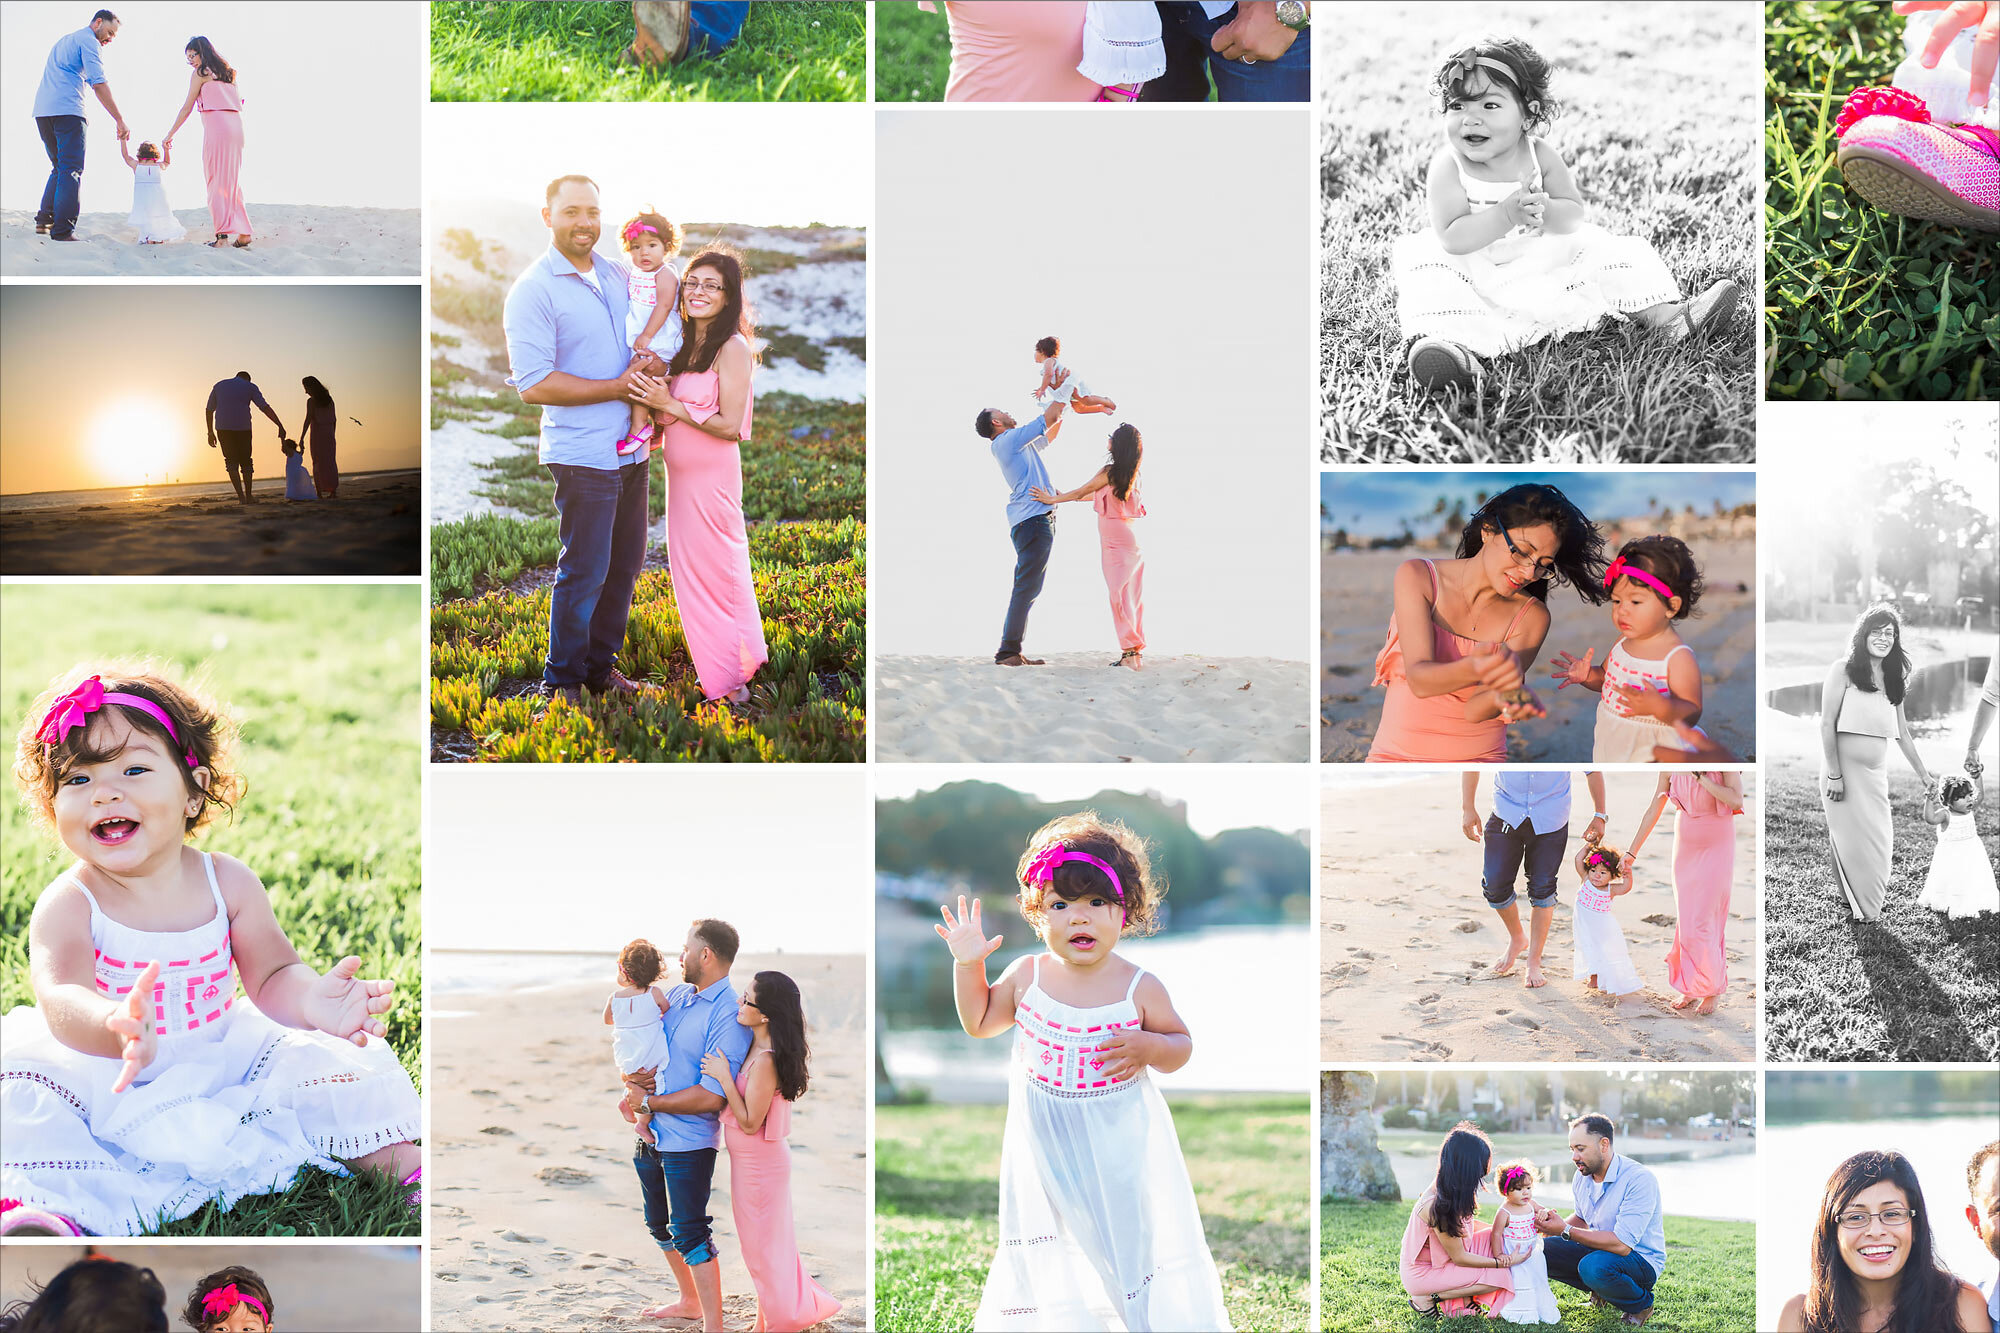 family_portraits_gallery_stephen_grant_photography.jpg